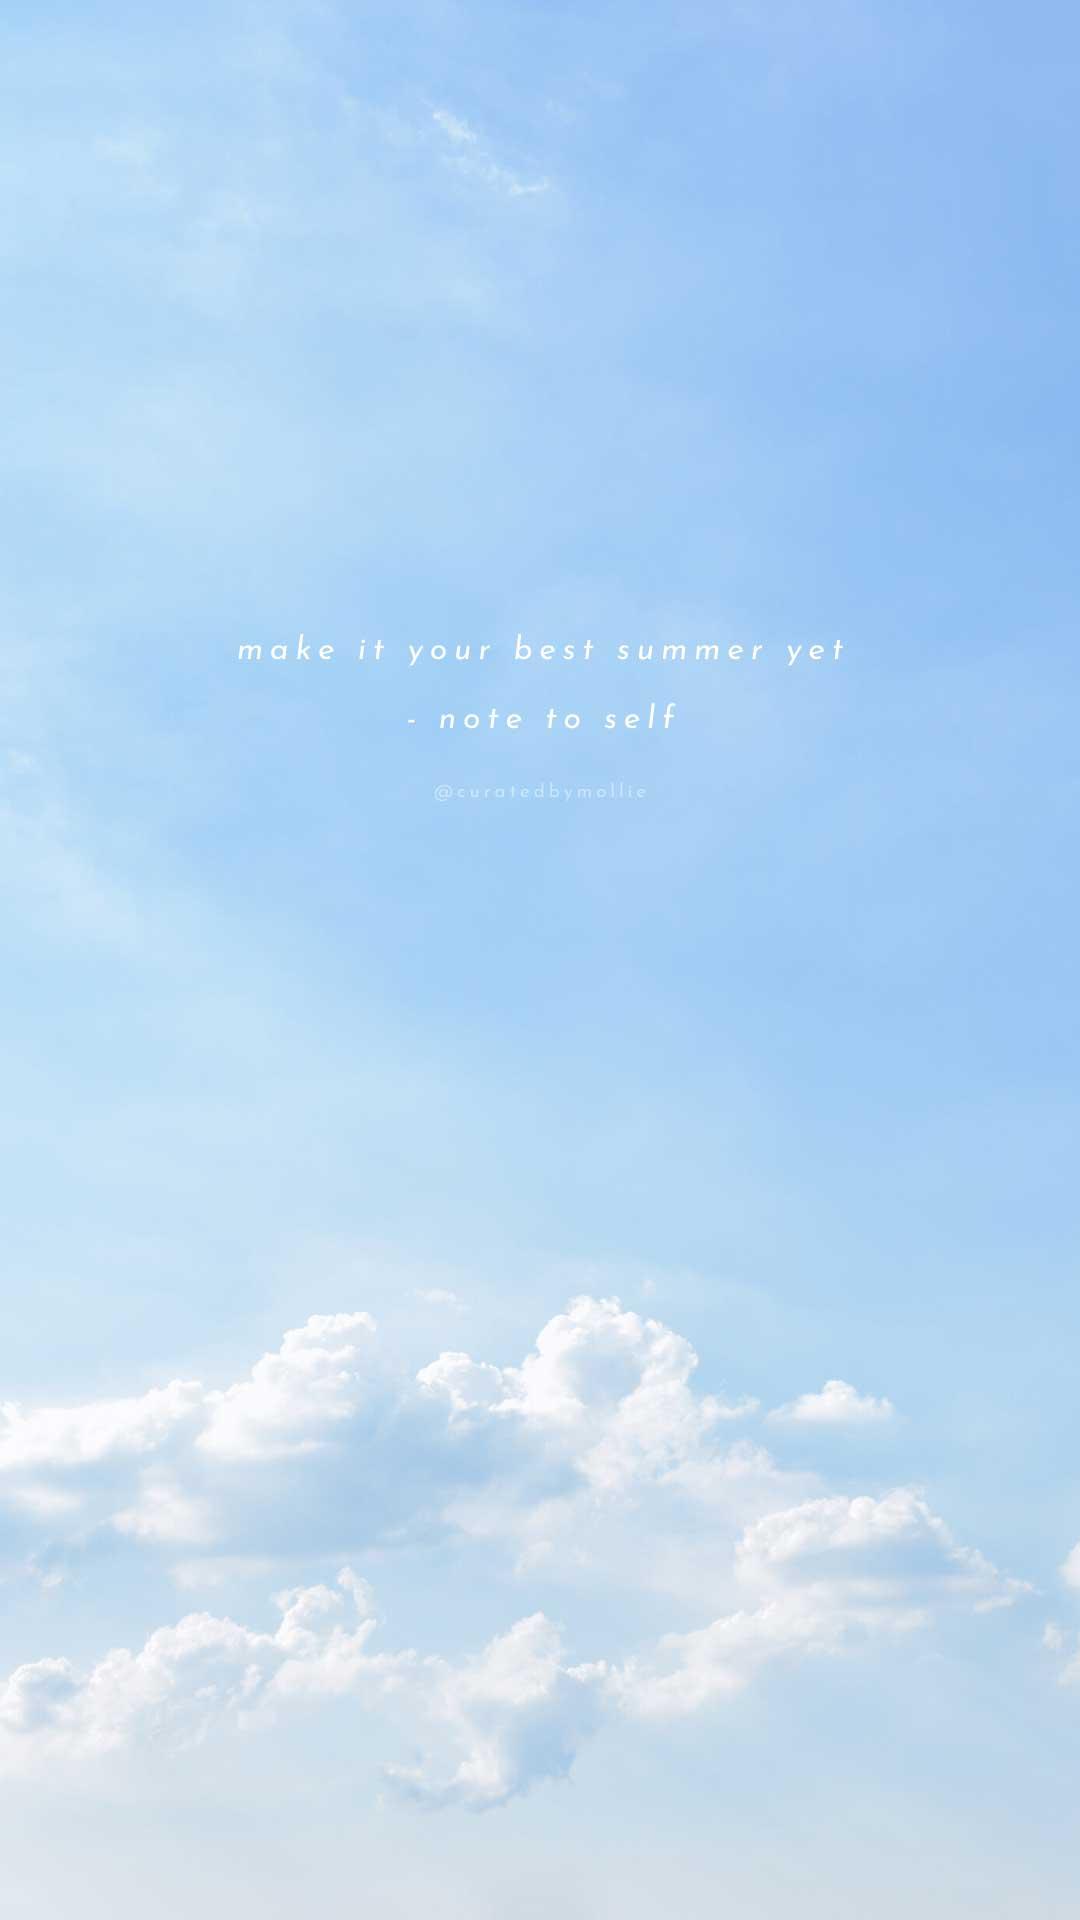 Summer-phone-wallpaper-@curatedbymolly-allaboutgoodvibes.com-Molly Larsen